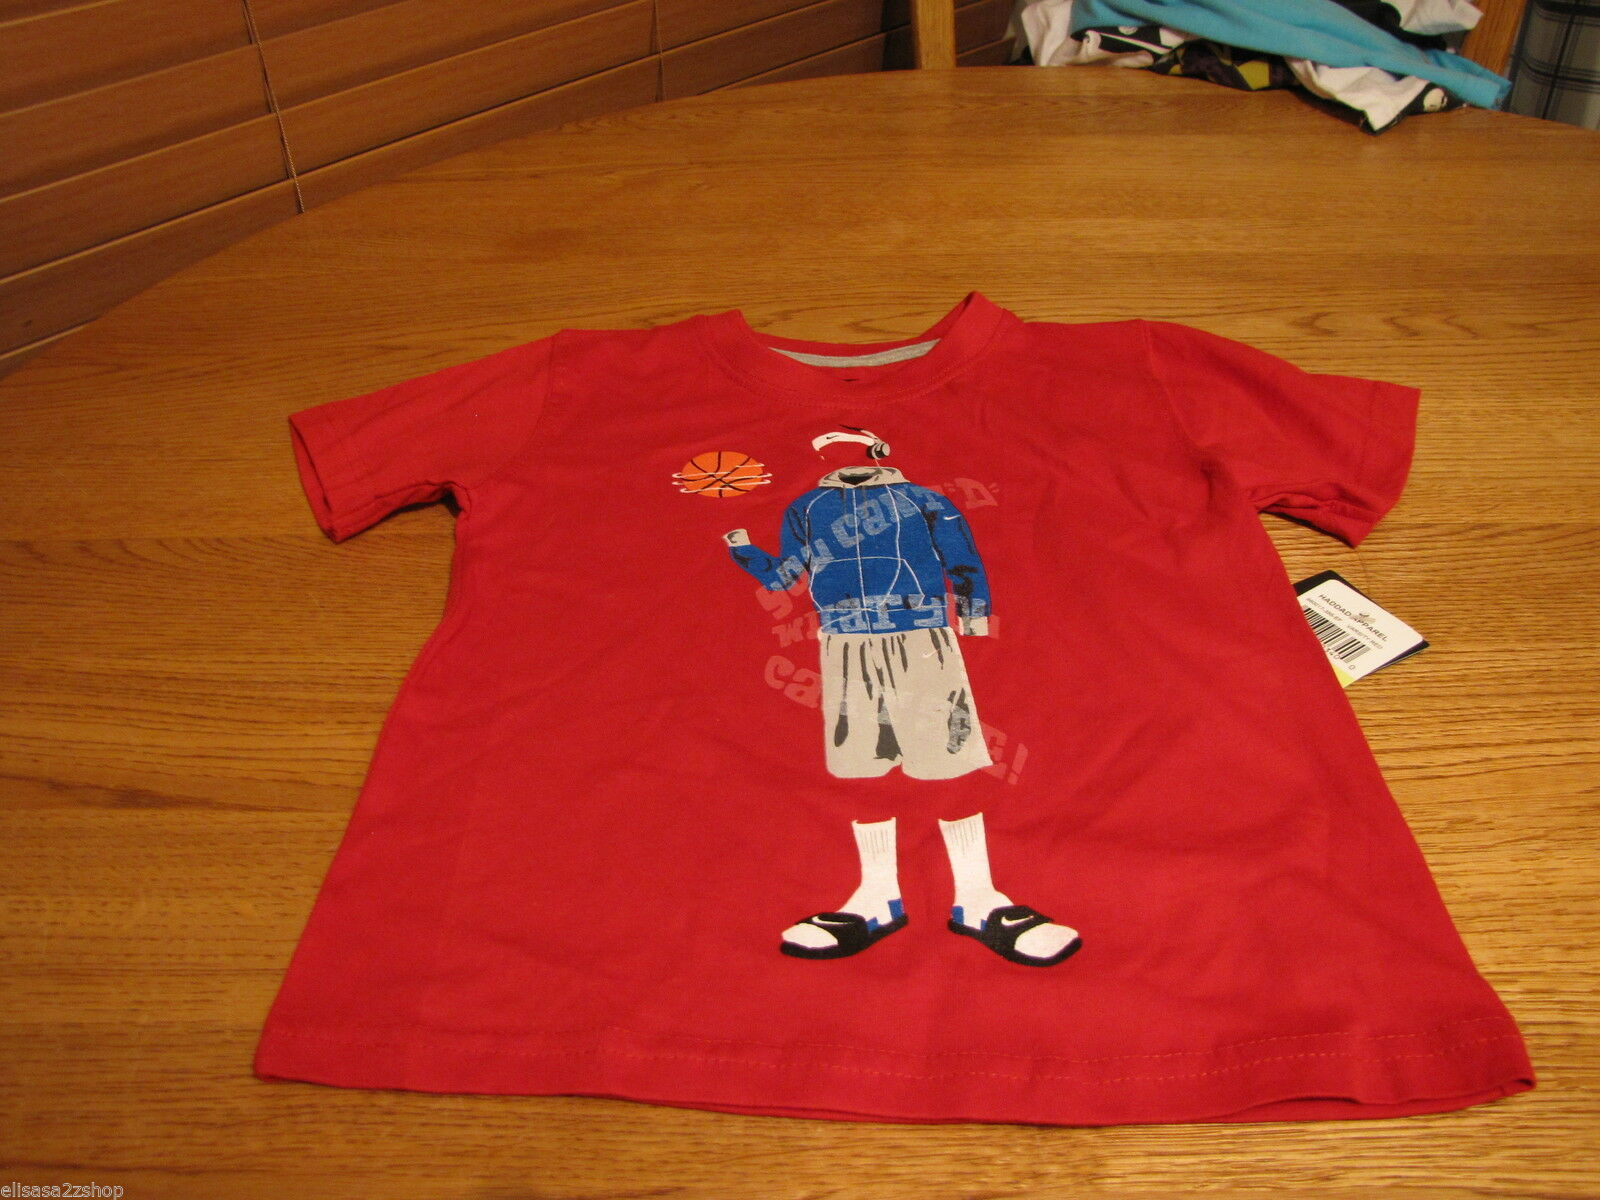 Boy's Youth 4 Nike varsity red basketball sports TEE T shirt TEE NEW NWT logo